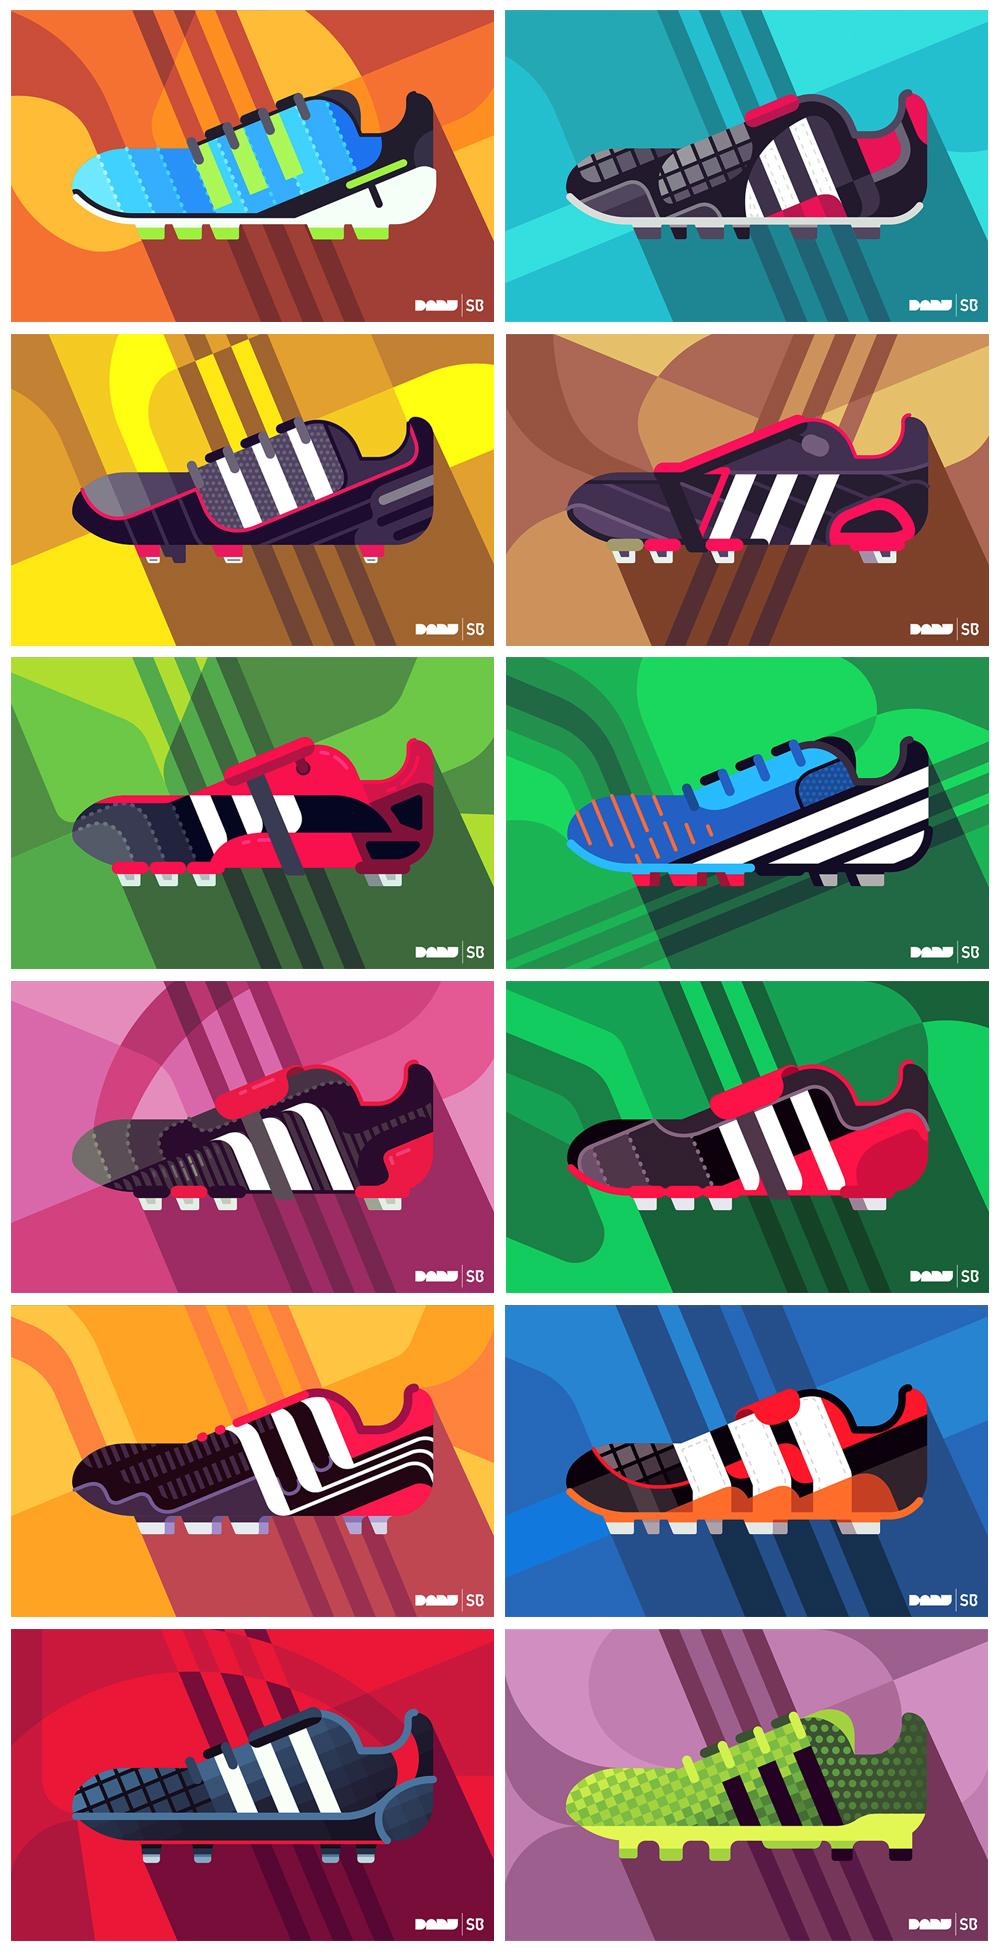 Adidas_Cleats.jpg